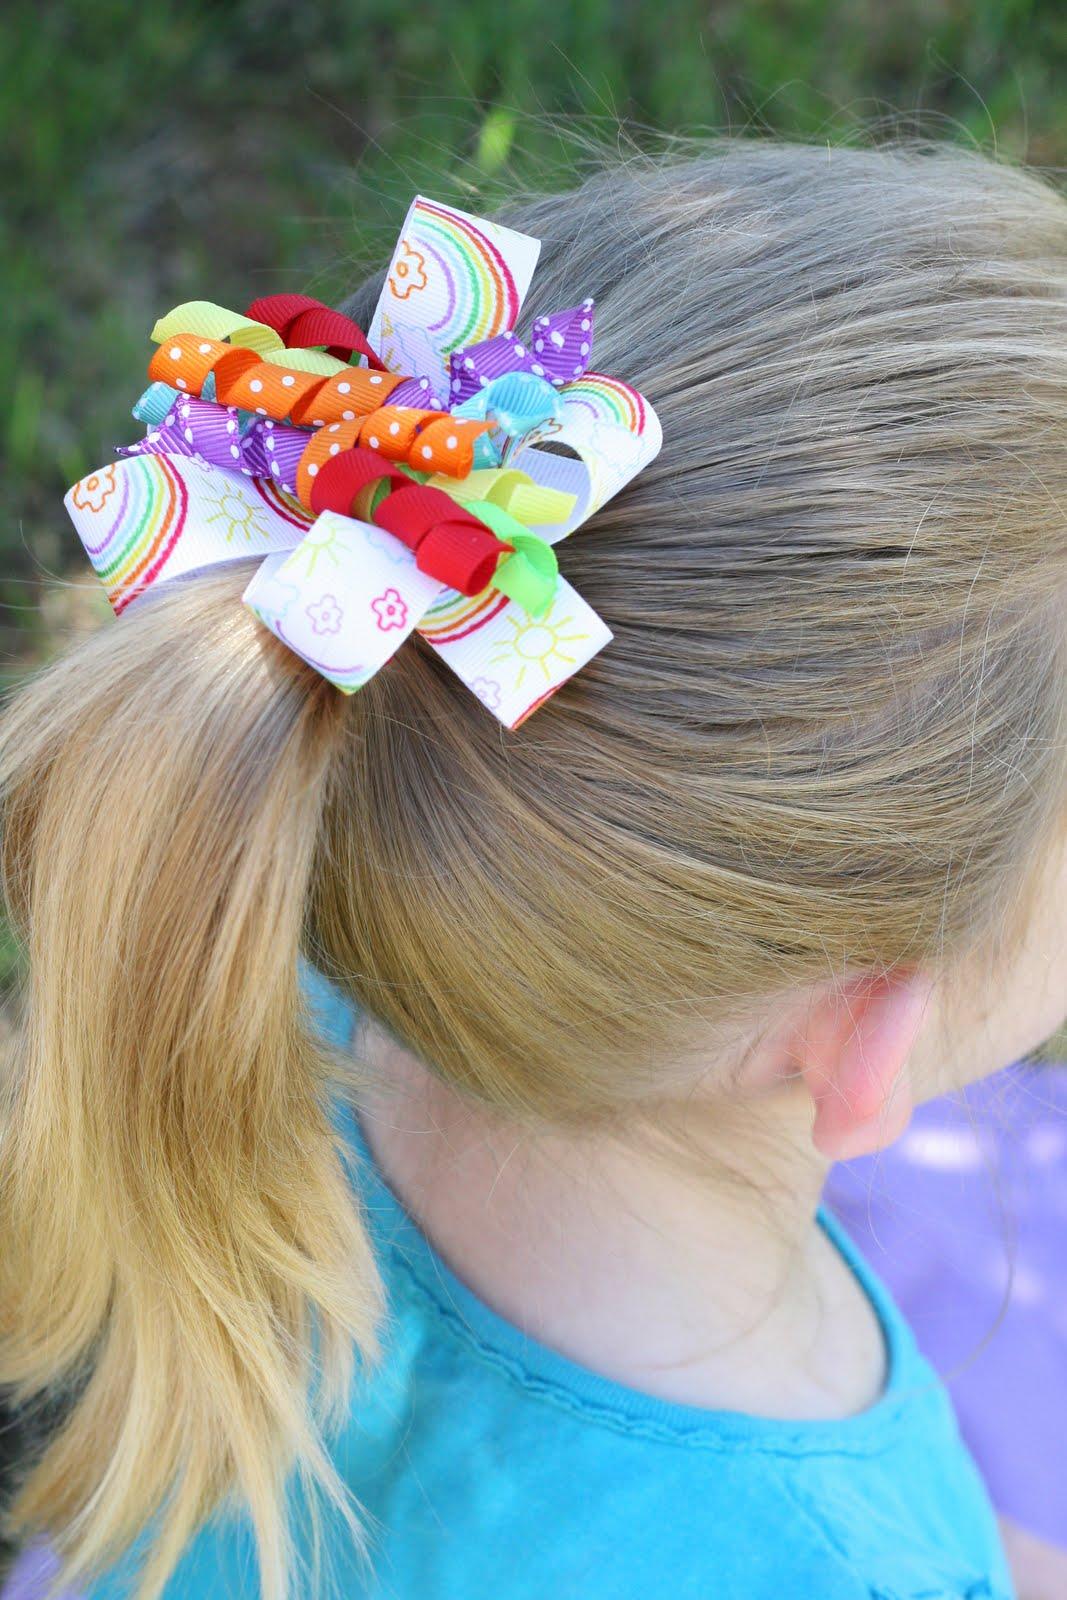 hair bows in curly hair - photo #31